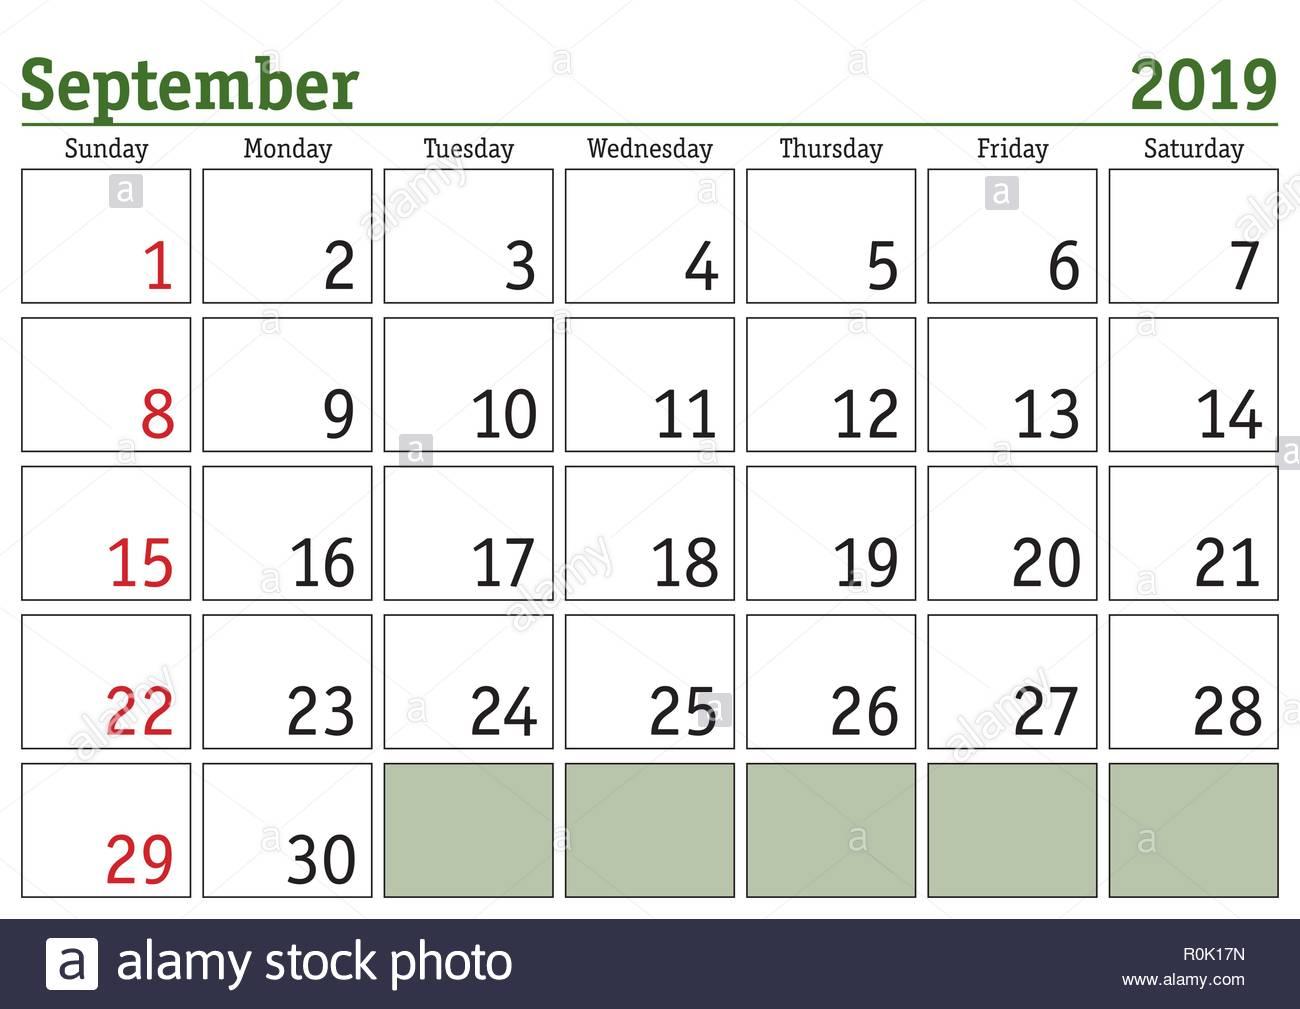 Simple Digital Calendar For September 2019 Vector Printable